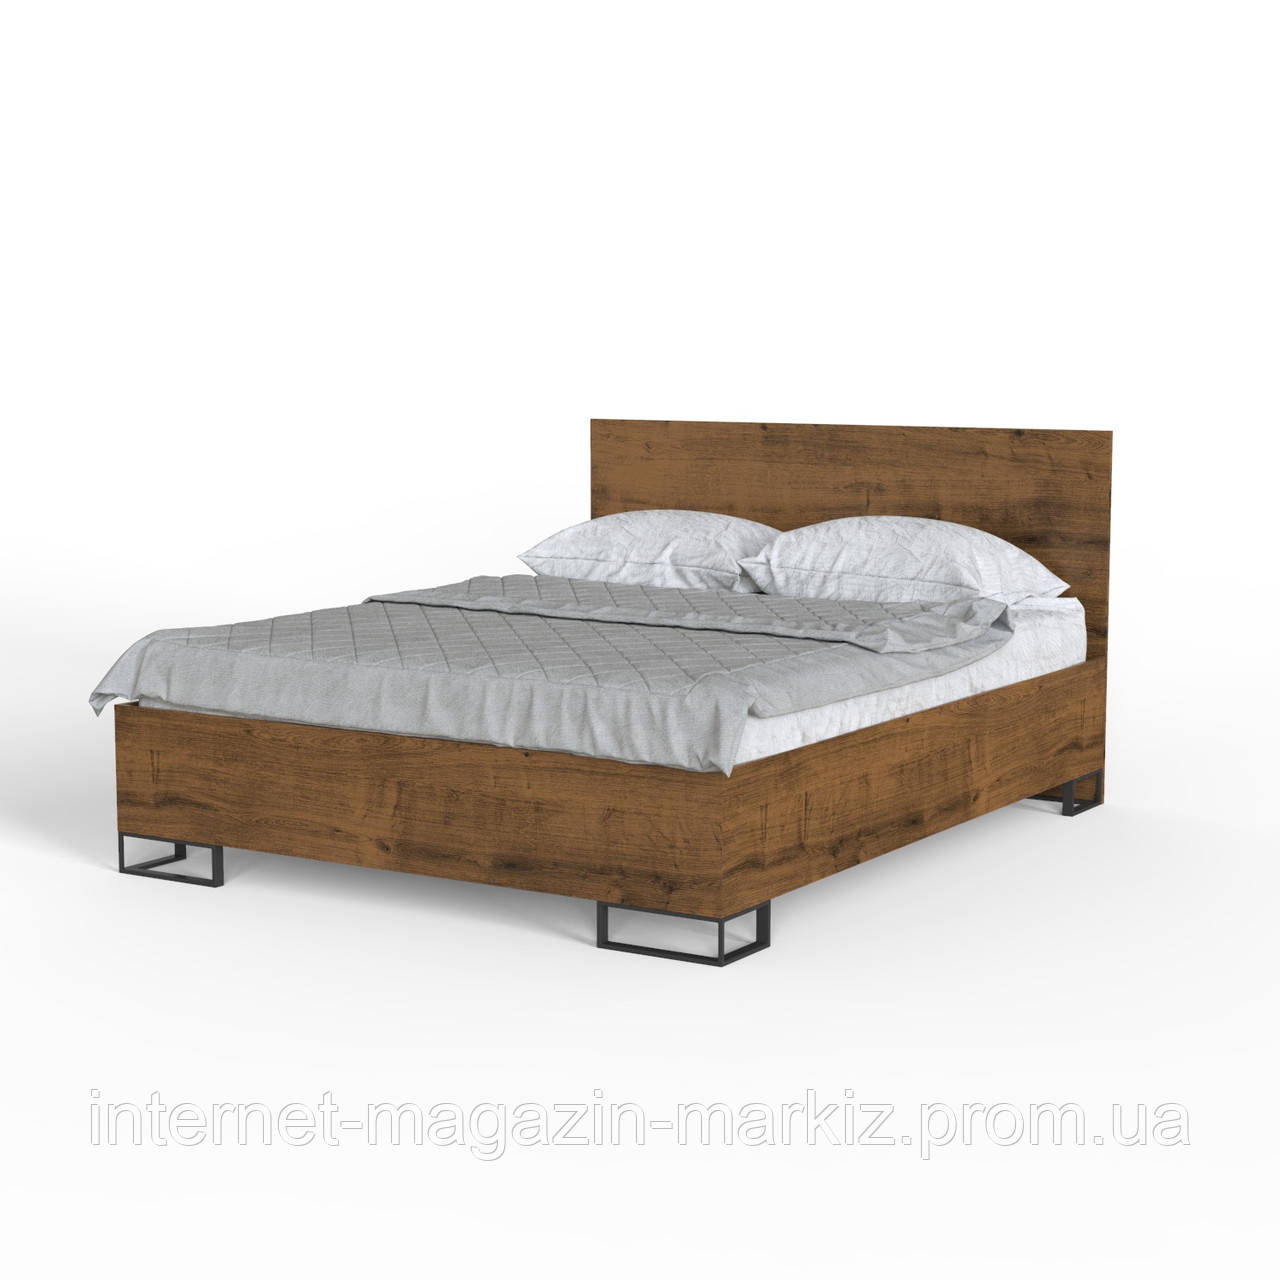 Ліжко Ascet Дуб Саттер